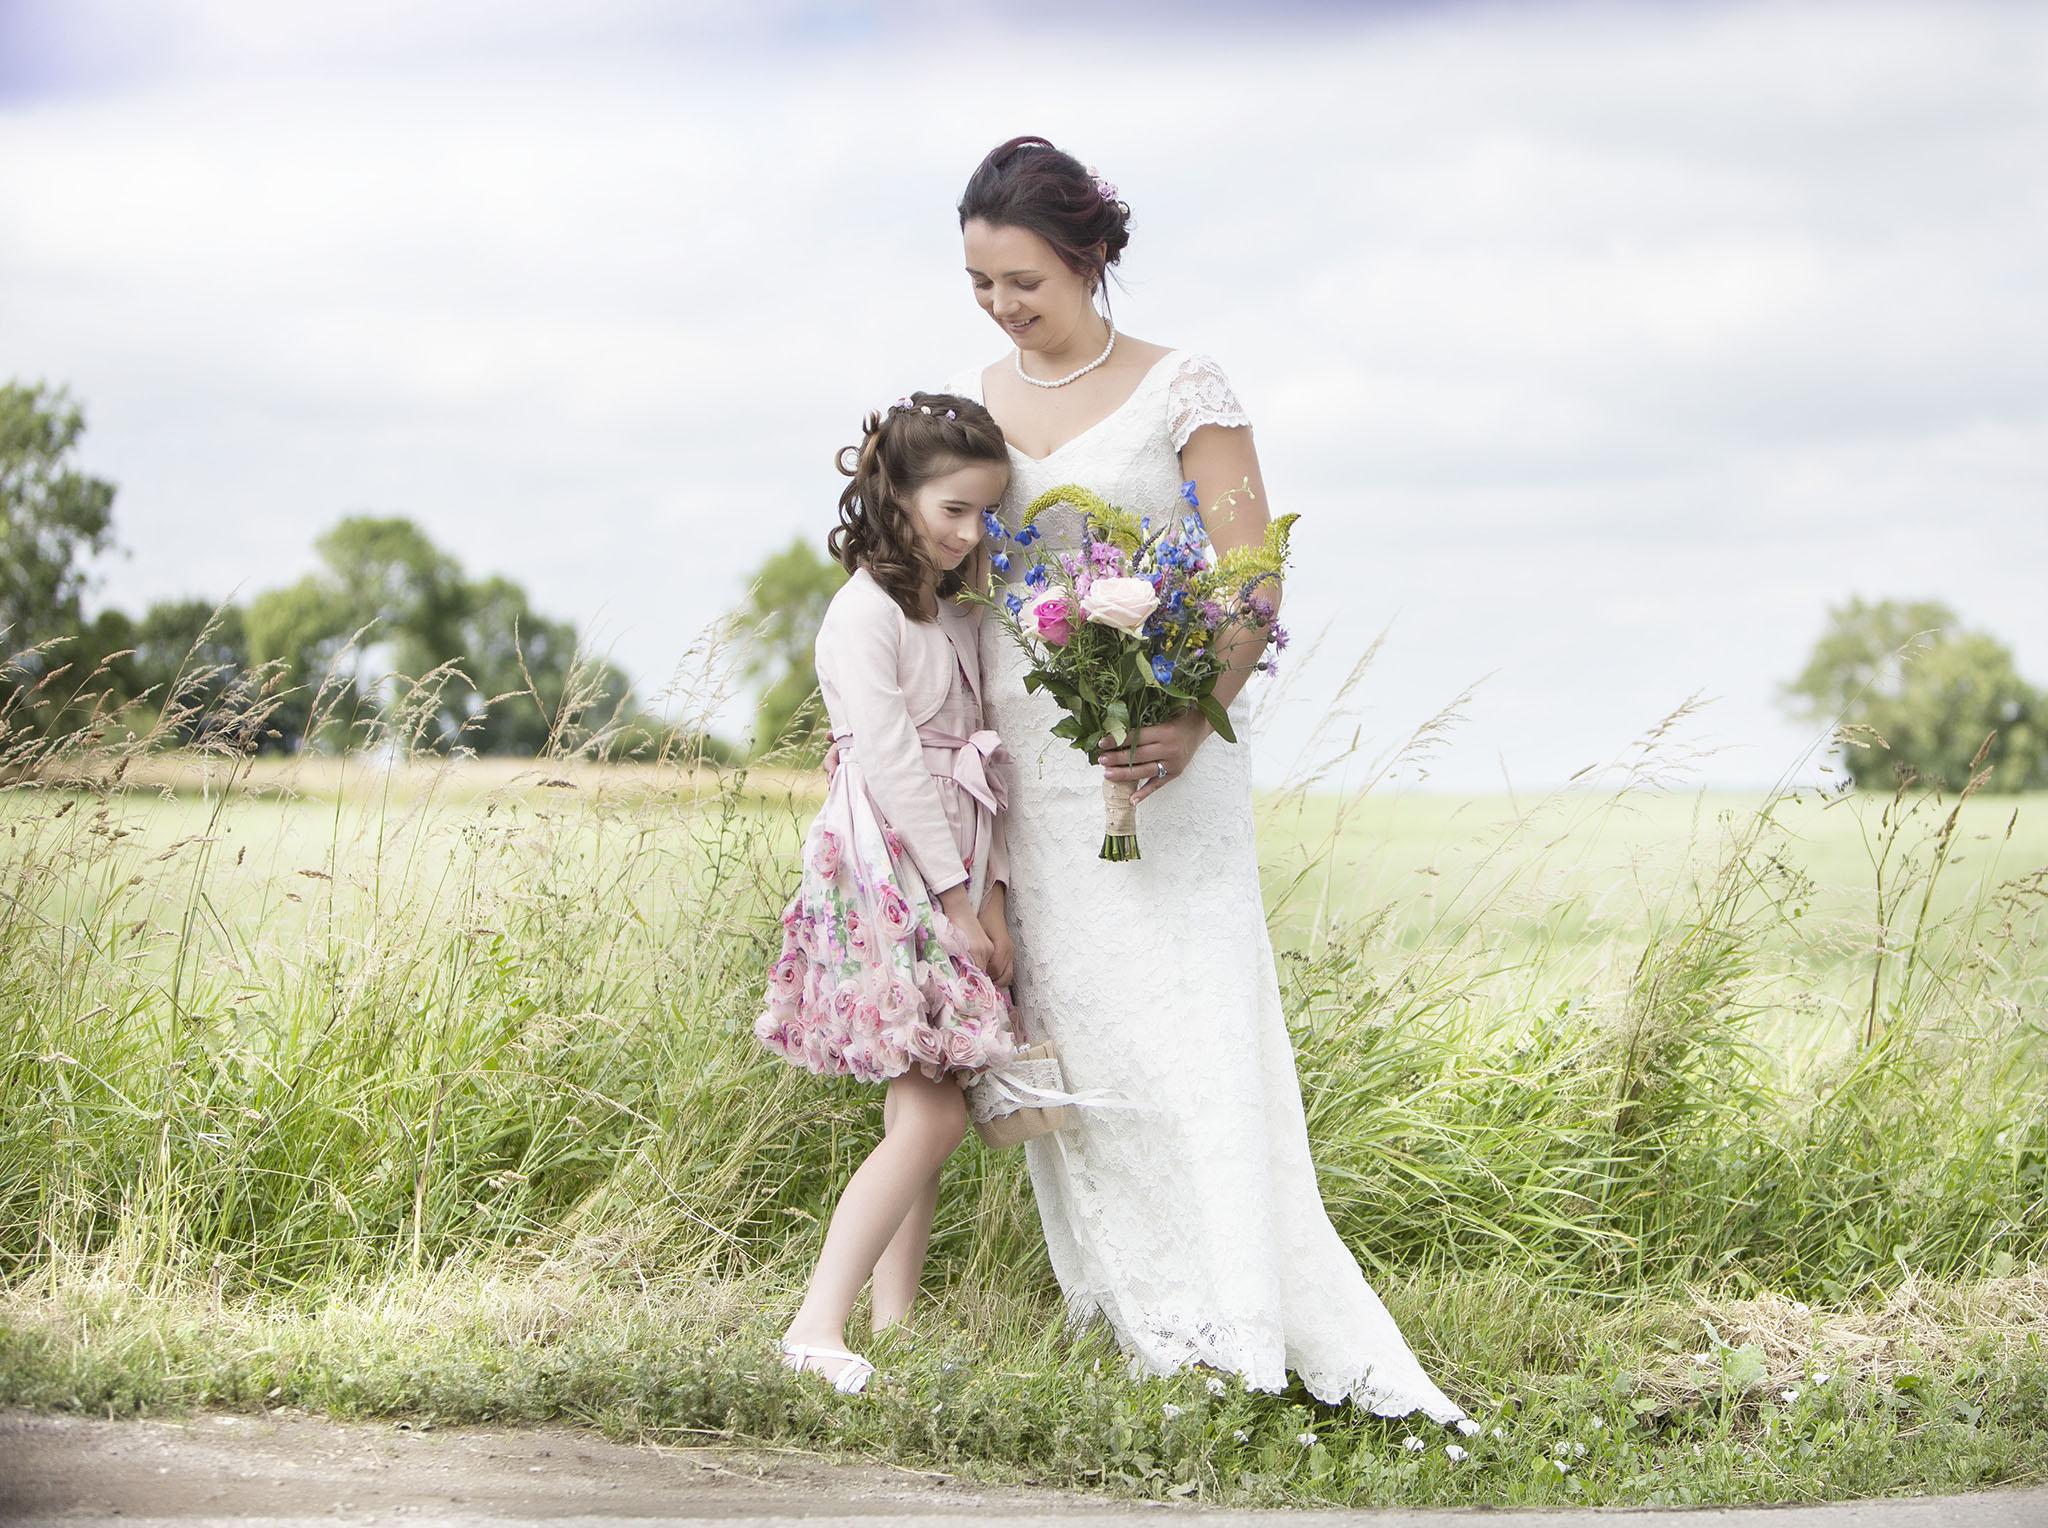 elizabethgphotography_kingslangley_hertfordshire_fineart_wedding_photography_lincolnshire_anna_simon_05.jpg